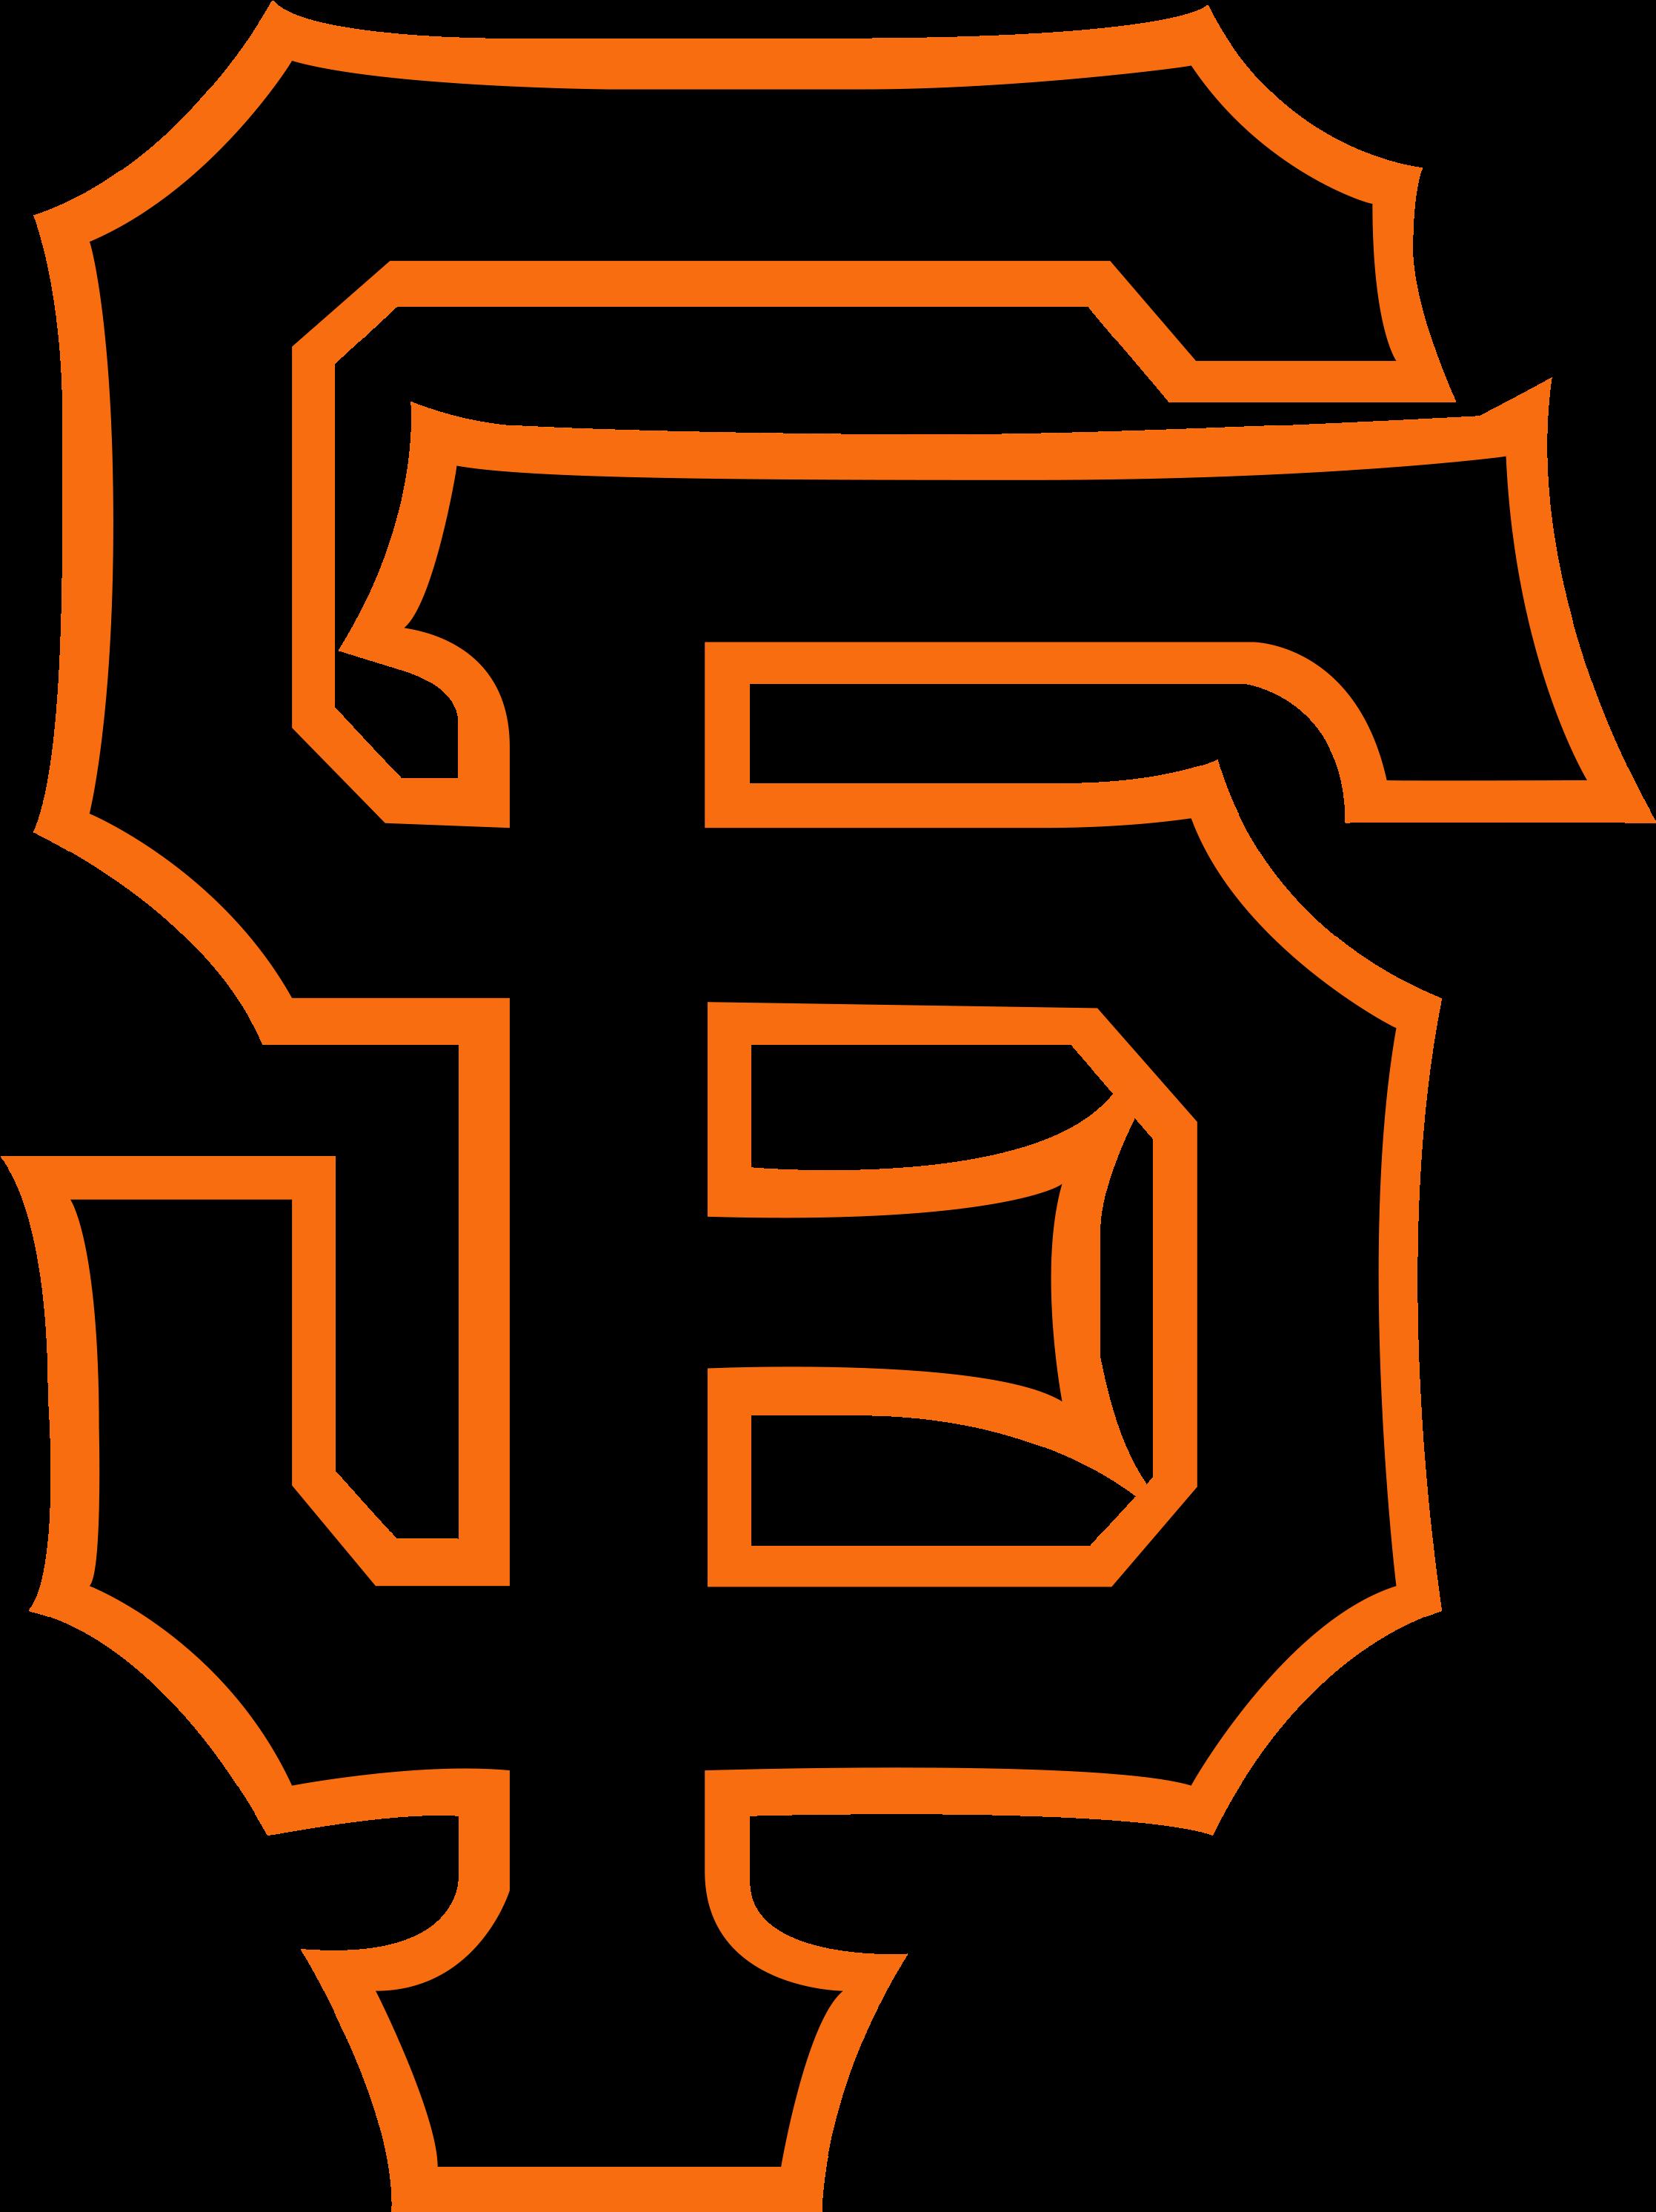 Pin By Veronica On Sf Giants Sf Giants Logo San Francisco Giants Logo San Francisco Giants